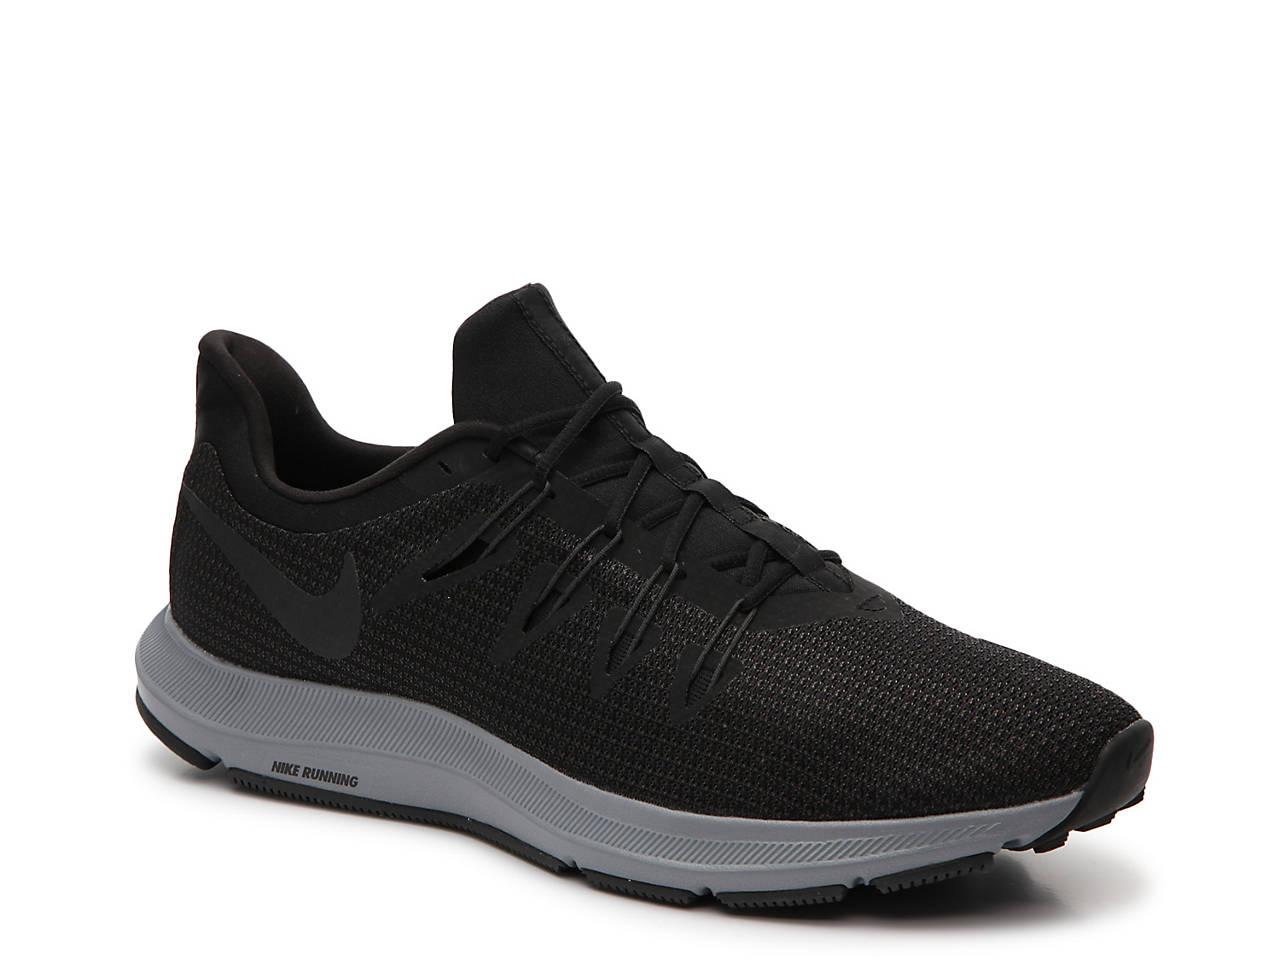 7ebe2c12680c Nike Quest Lightweight Running Shoe - Men s Men s Shoes